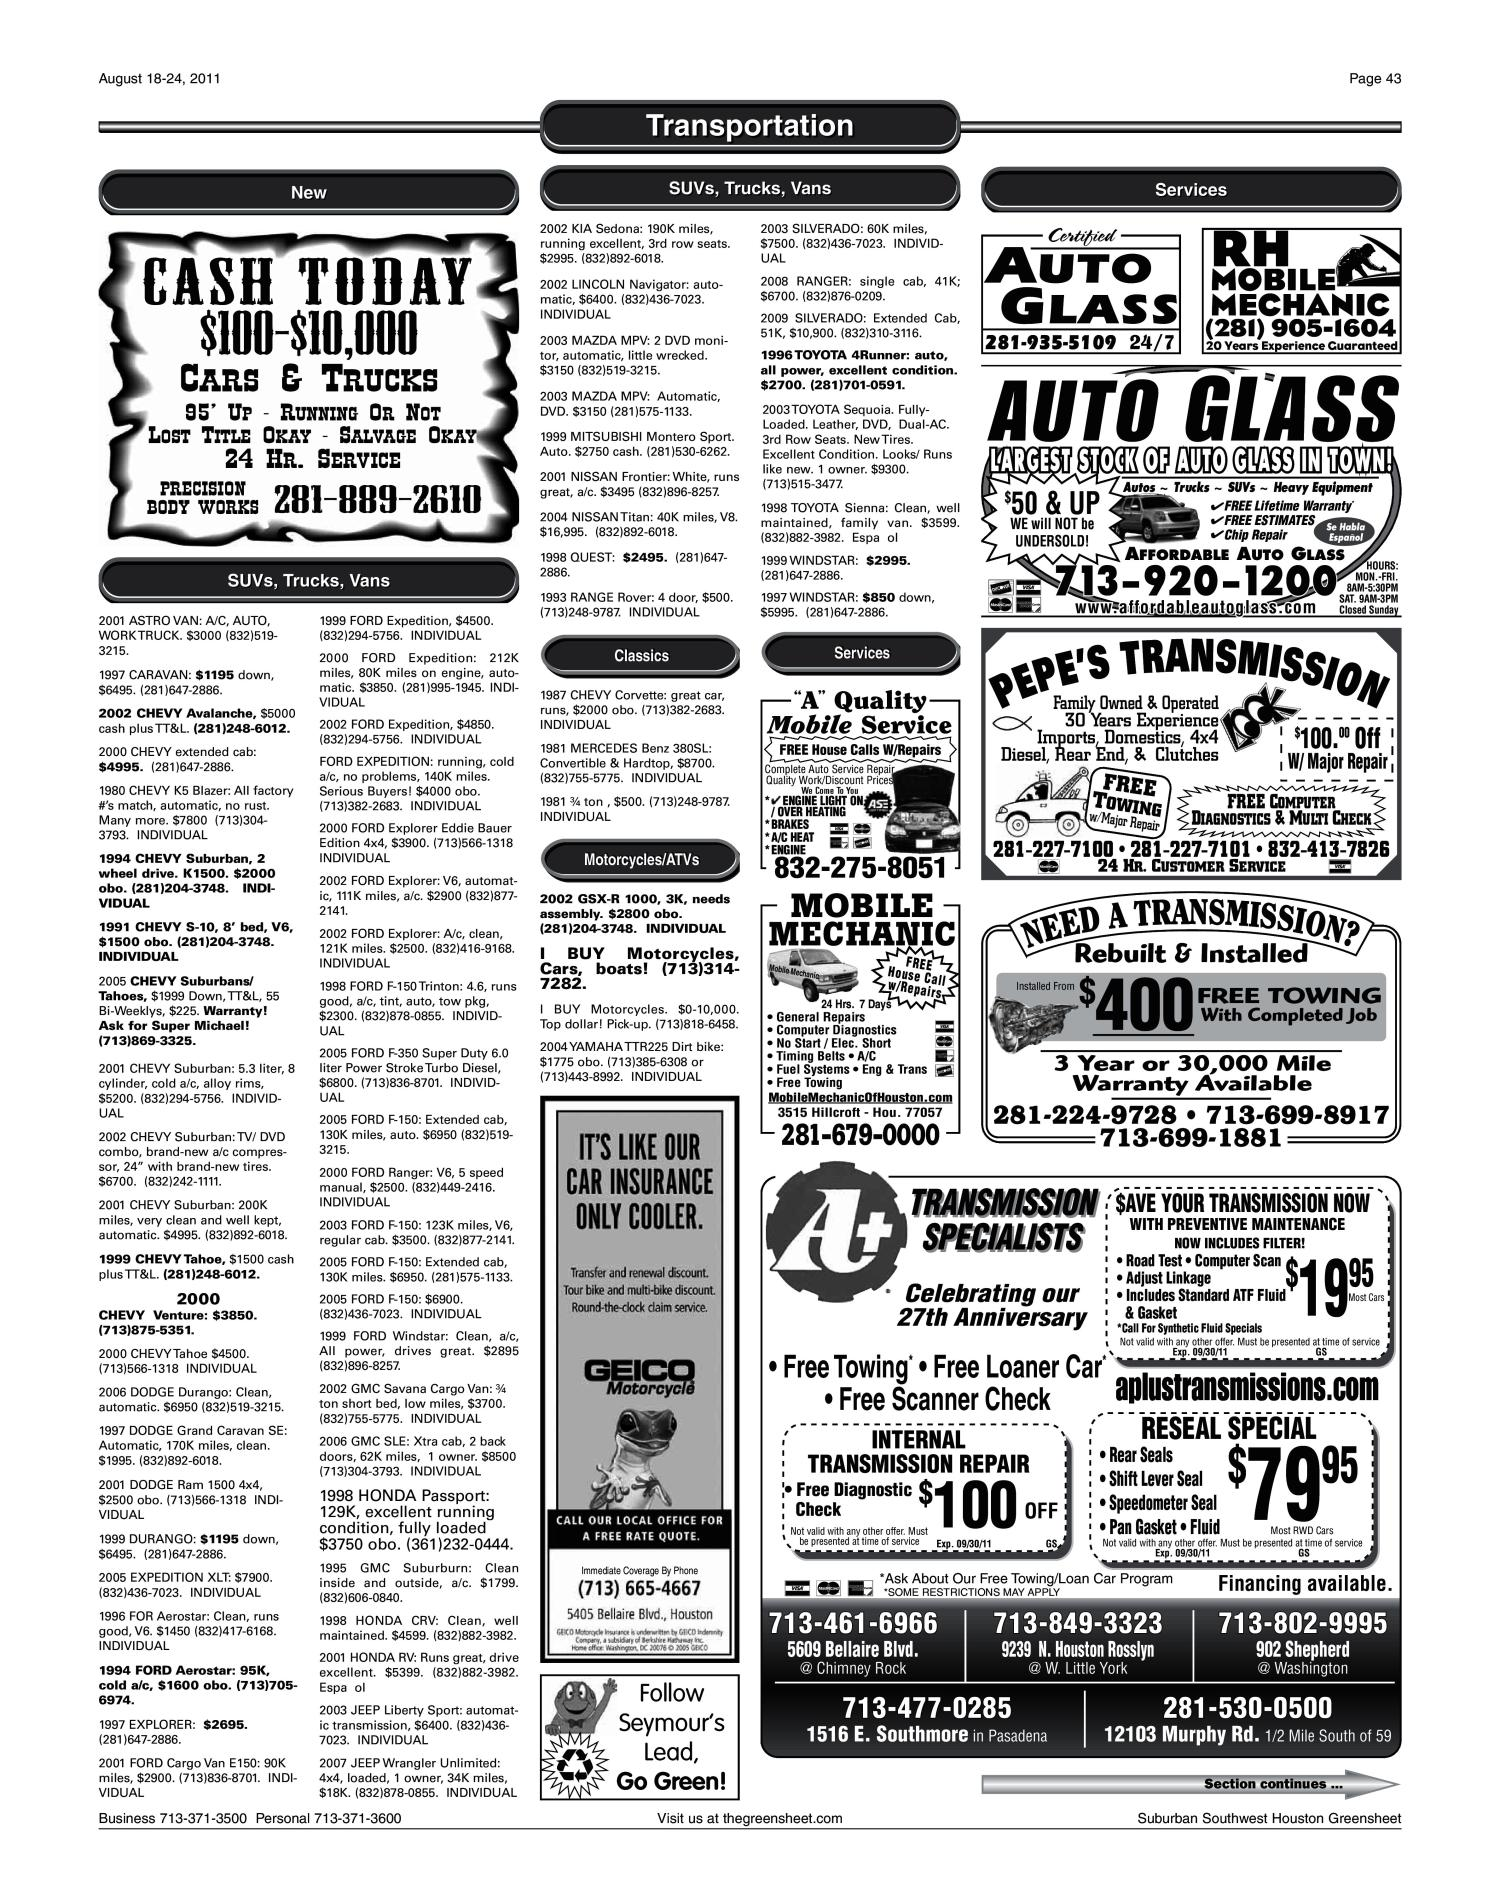 The Greensheet Houston Tex Vol 42 No 345 Ed 1 Thursday 2001 Mitsubishi Montero Timing Belt August 18 2011 Page 43 Of 48 Portal To Texas History